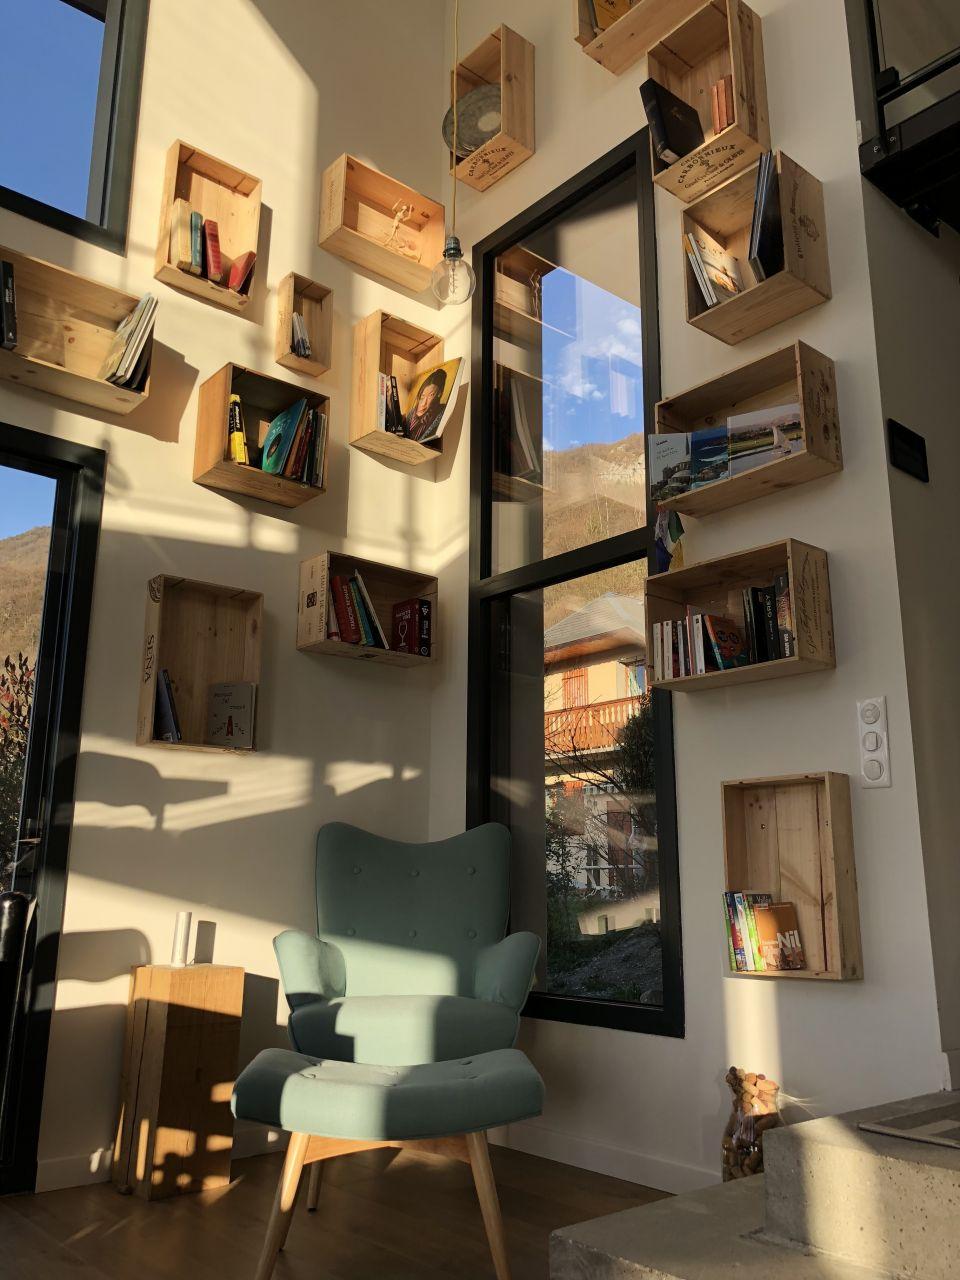 New bibliothèque